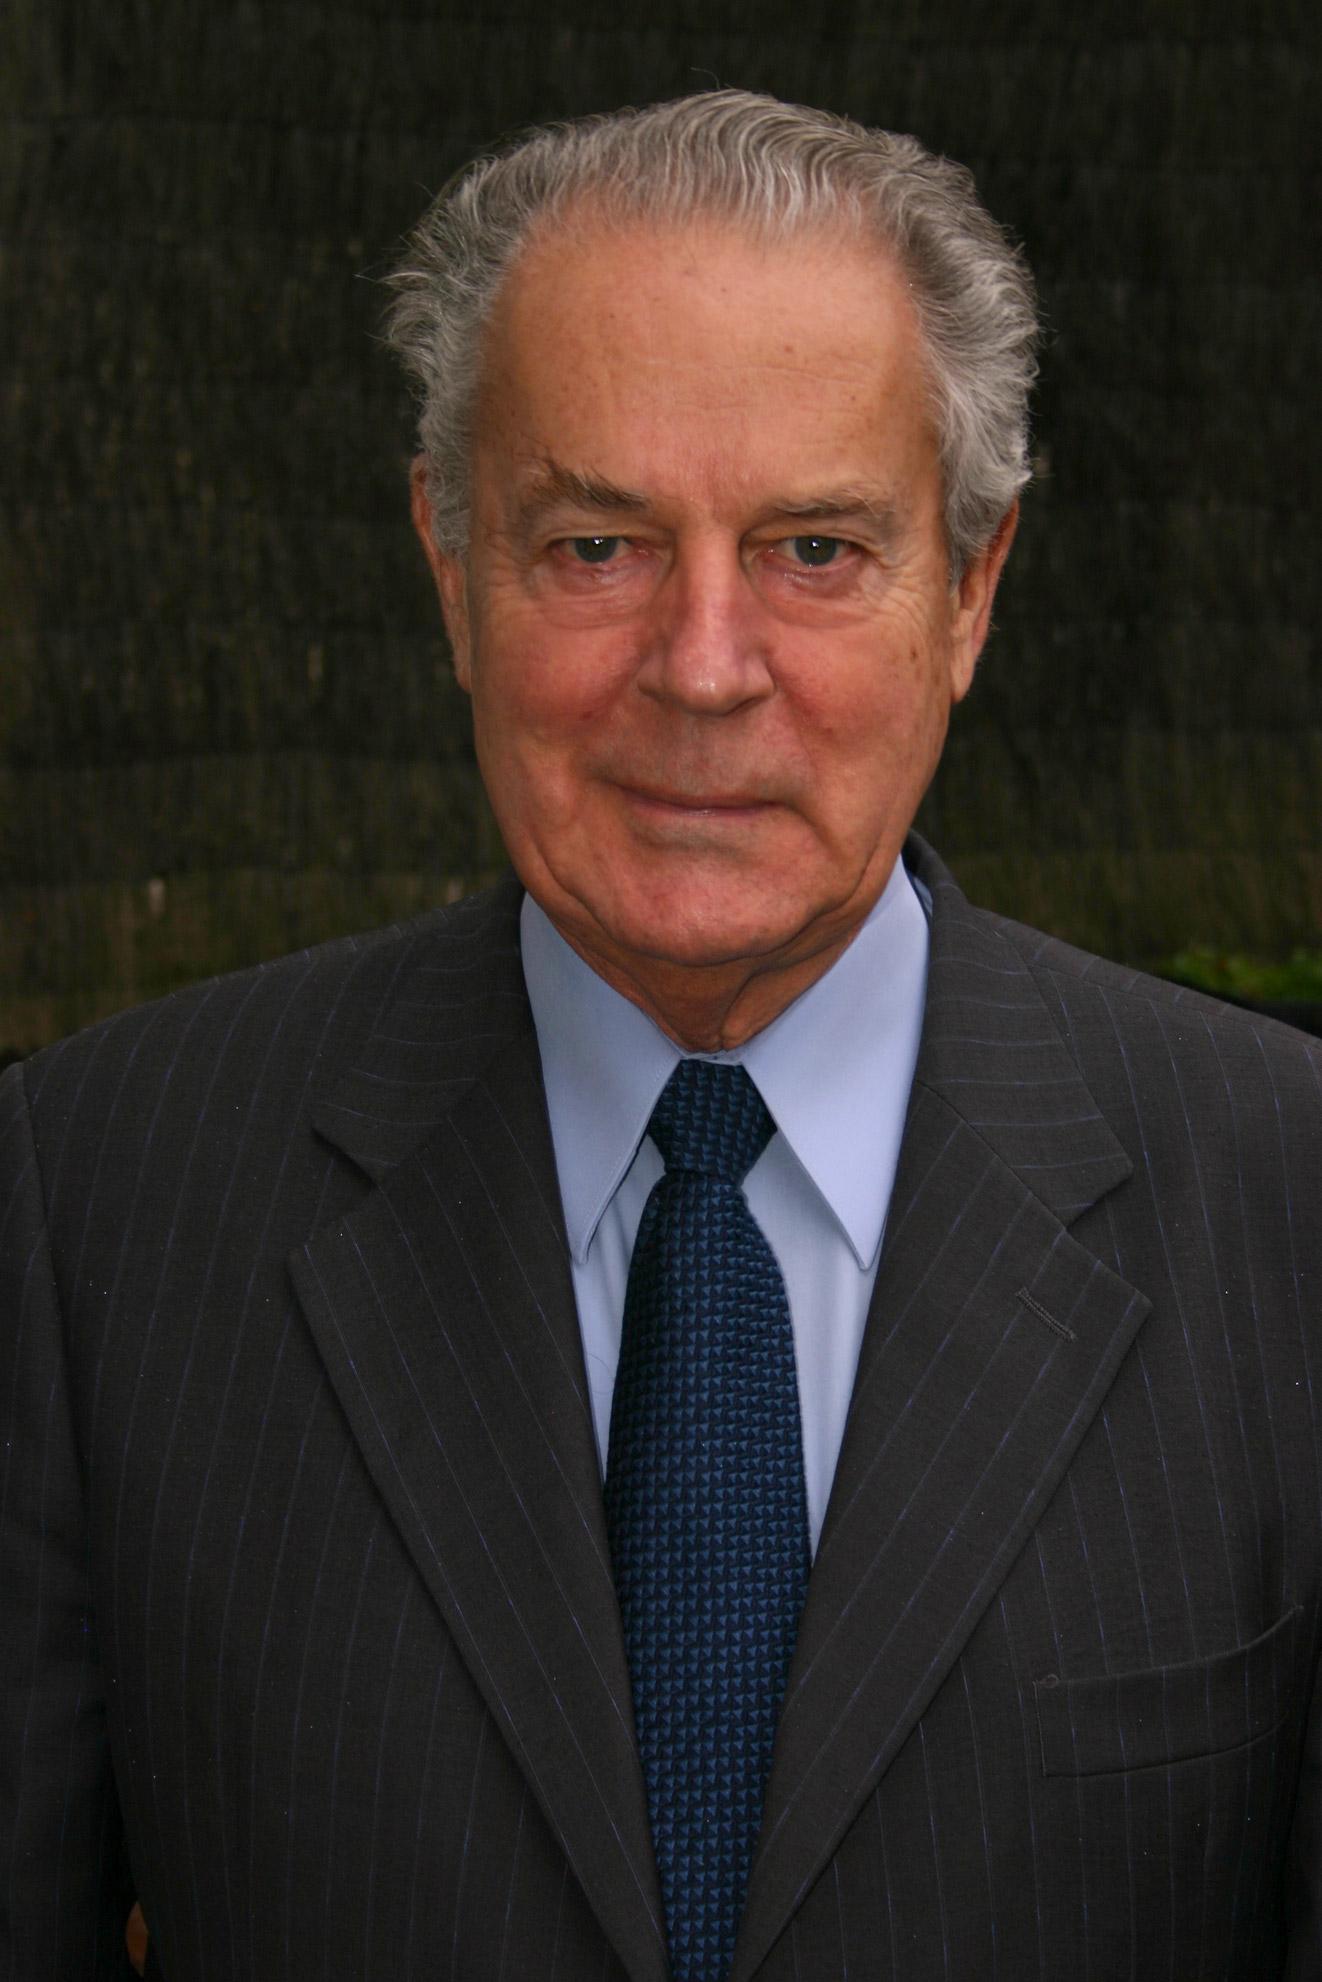 Ir. Leonard H. Schrank